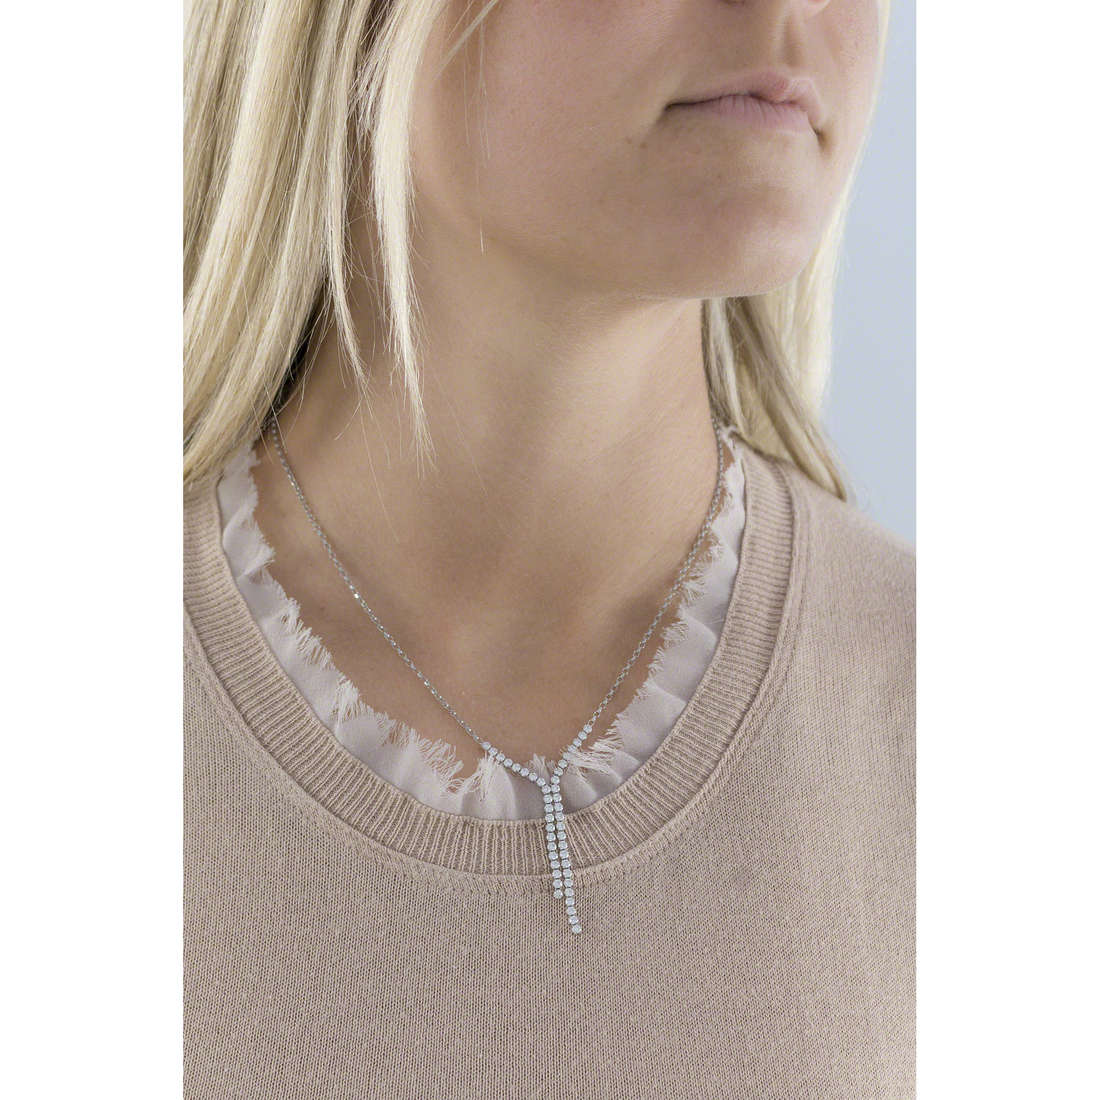 GioiaPura colliers femme GPSRSCL0622 indosso